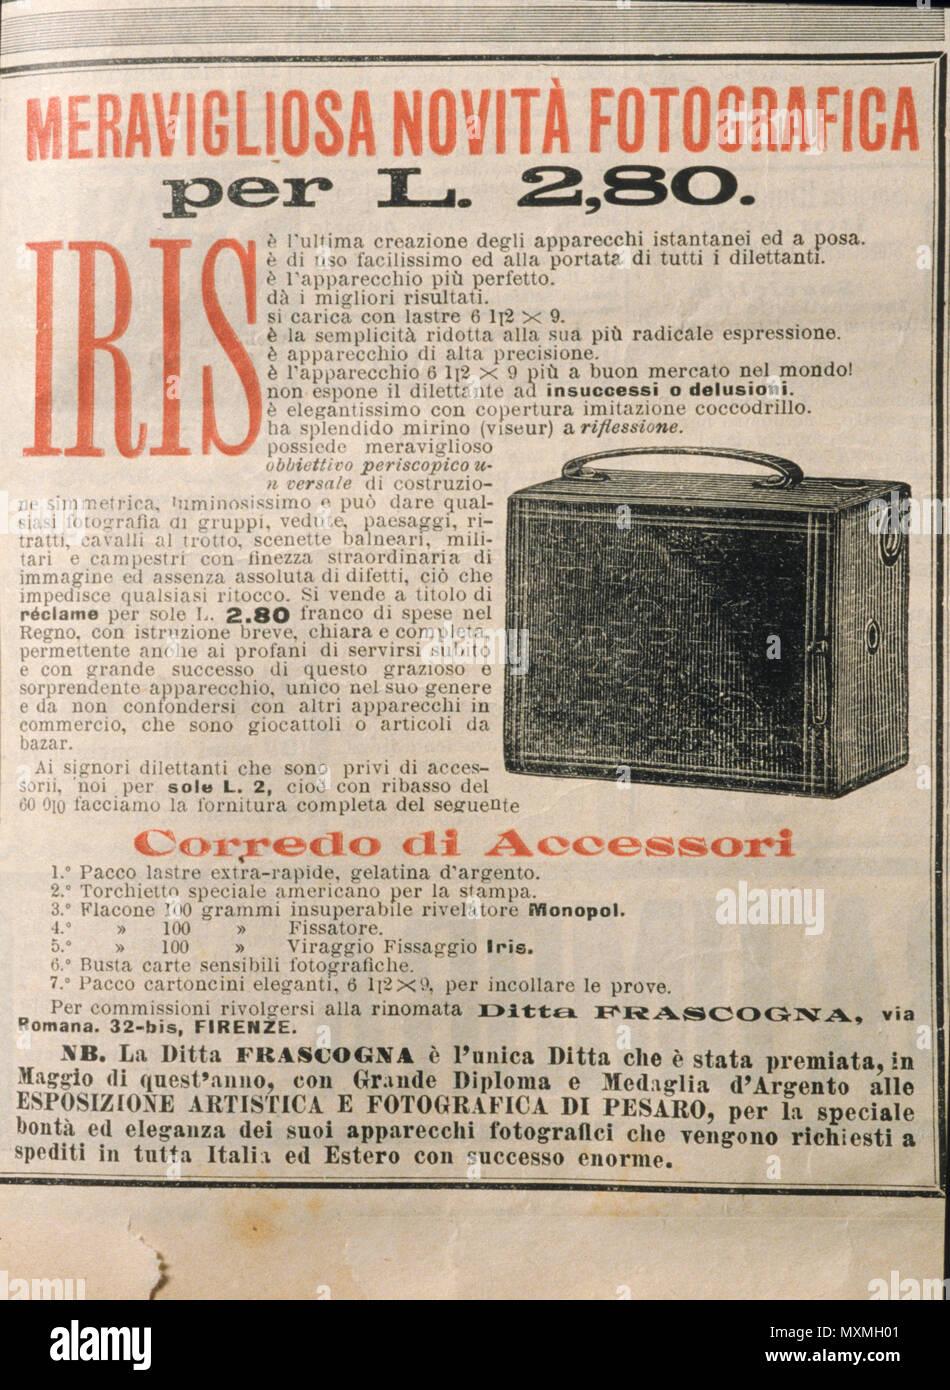 iris, photographic equipment, advertising - Stock Image